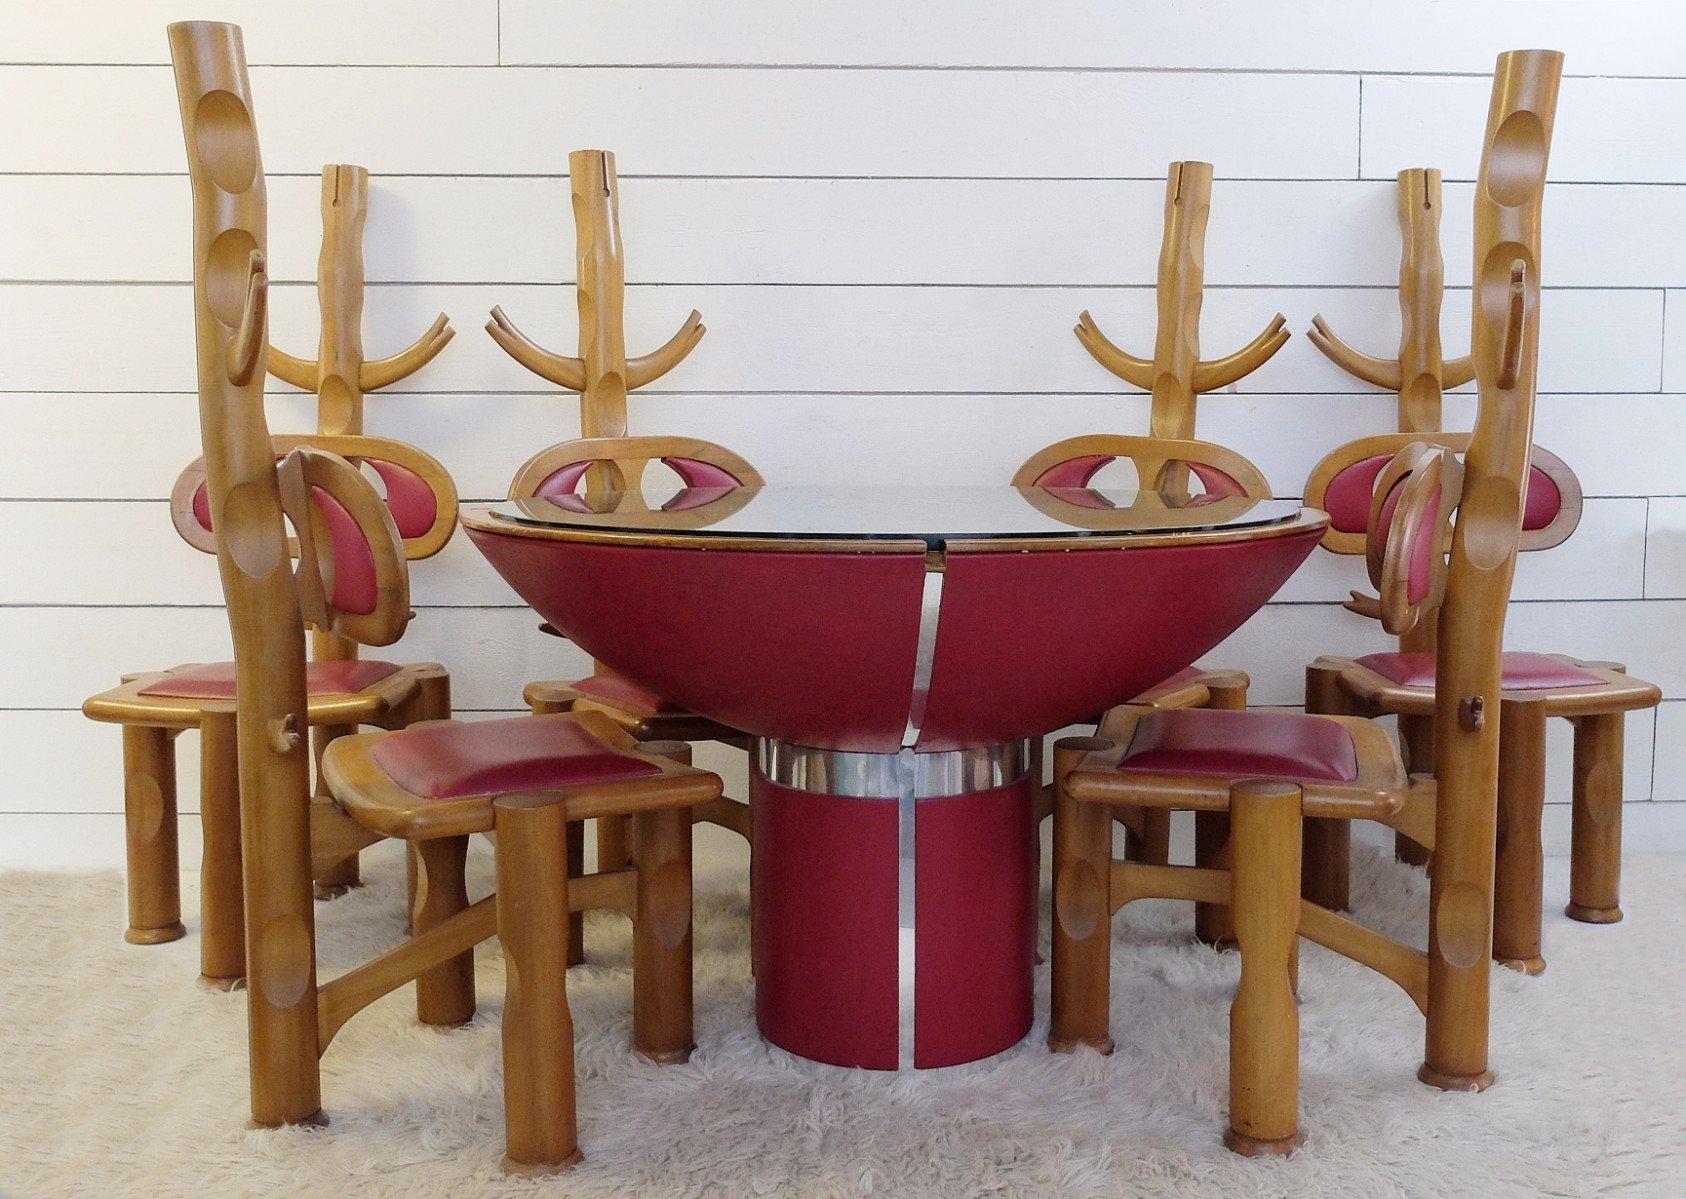 Tavolo da pranzo con 6 sedie vintage, Brasile in vendita su Pamono